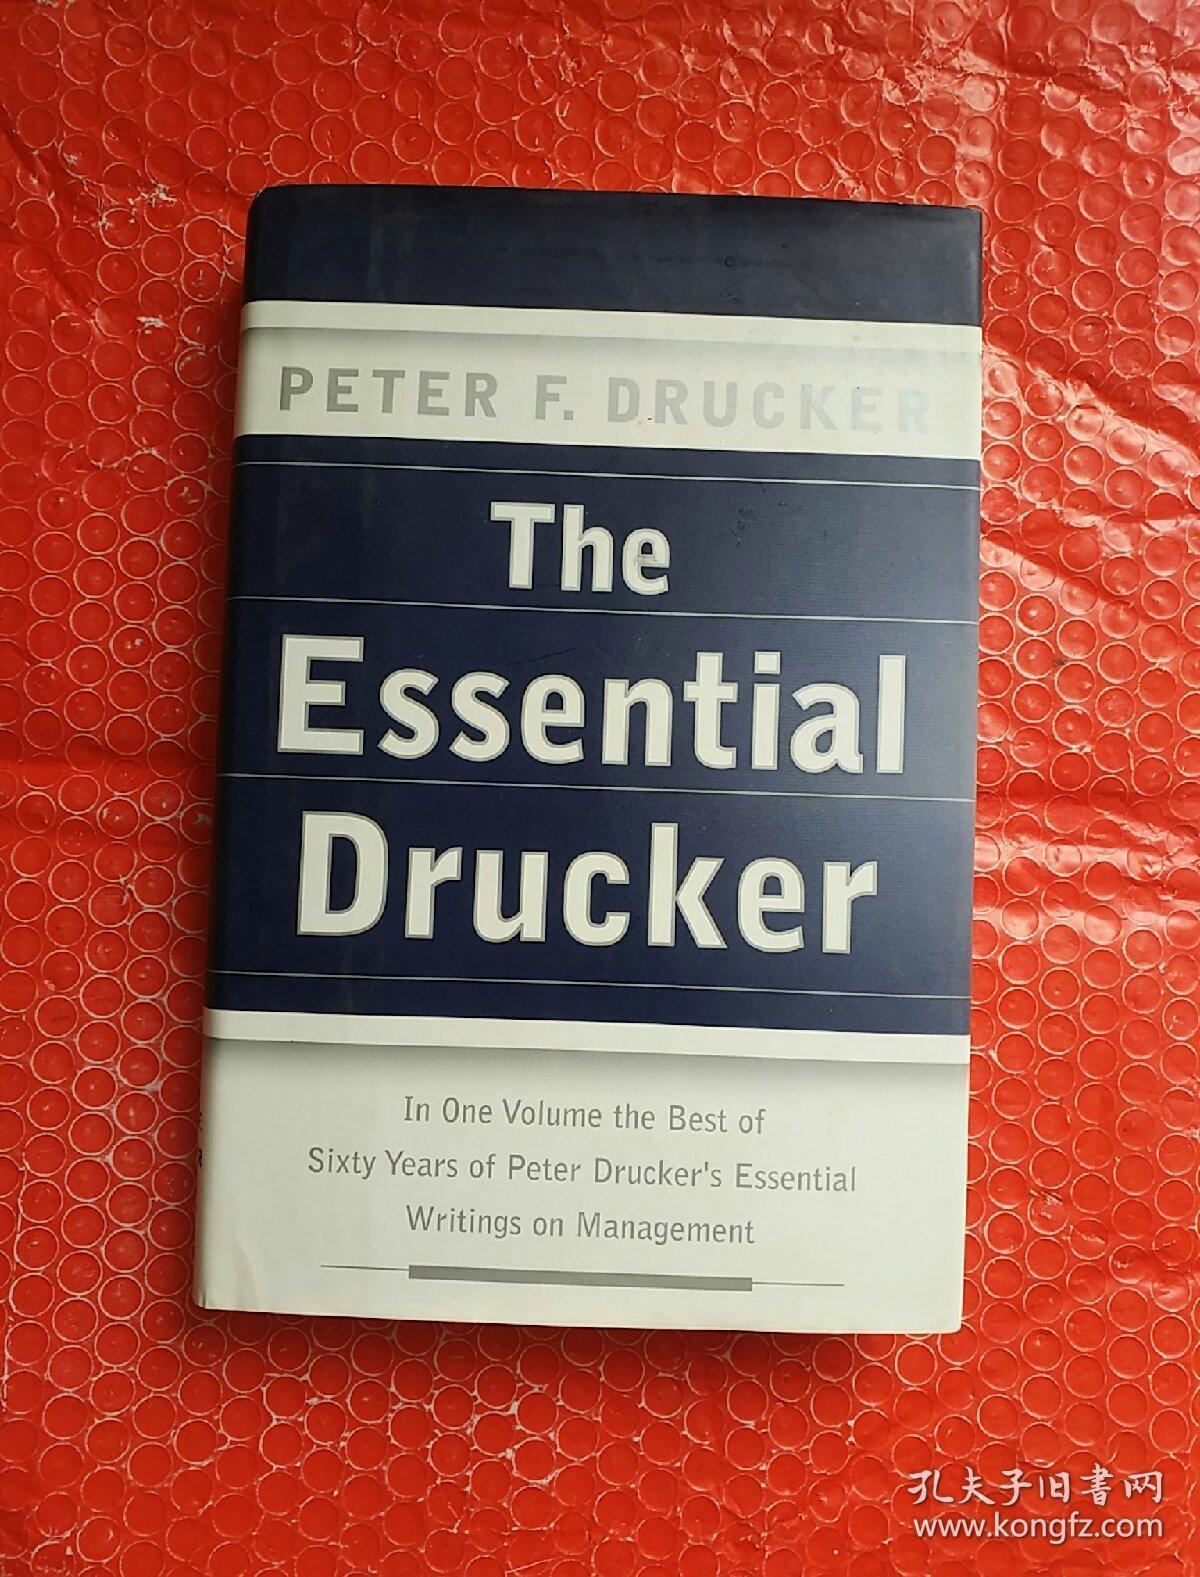 the essential drucker 最基本的德鲁克 英文原版